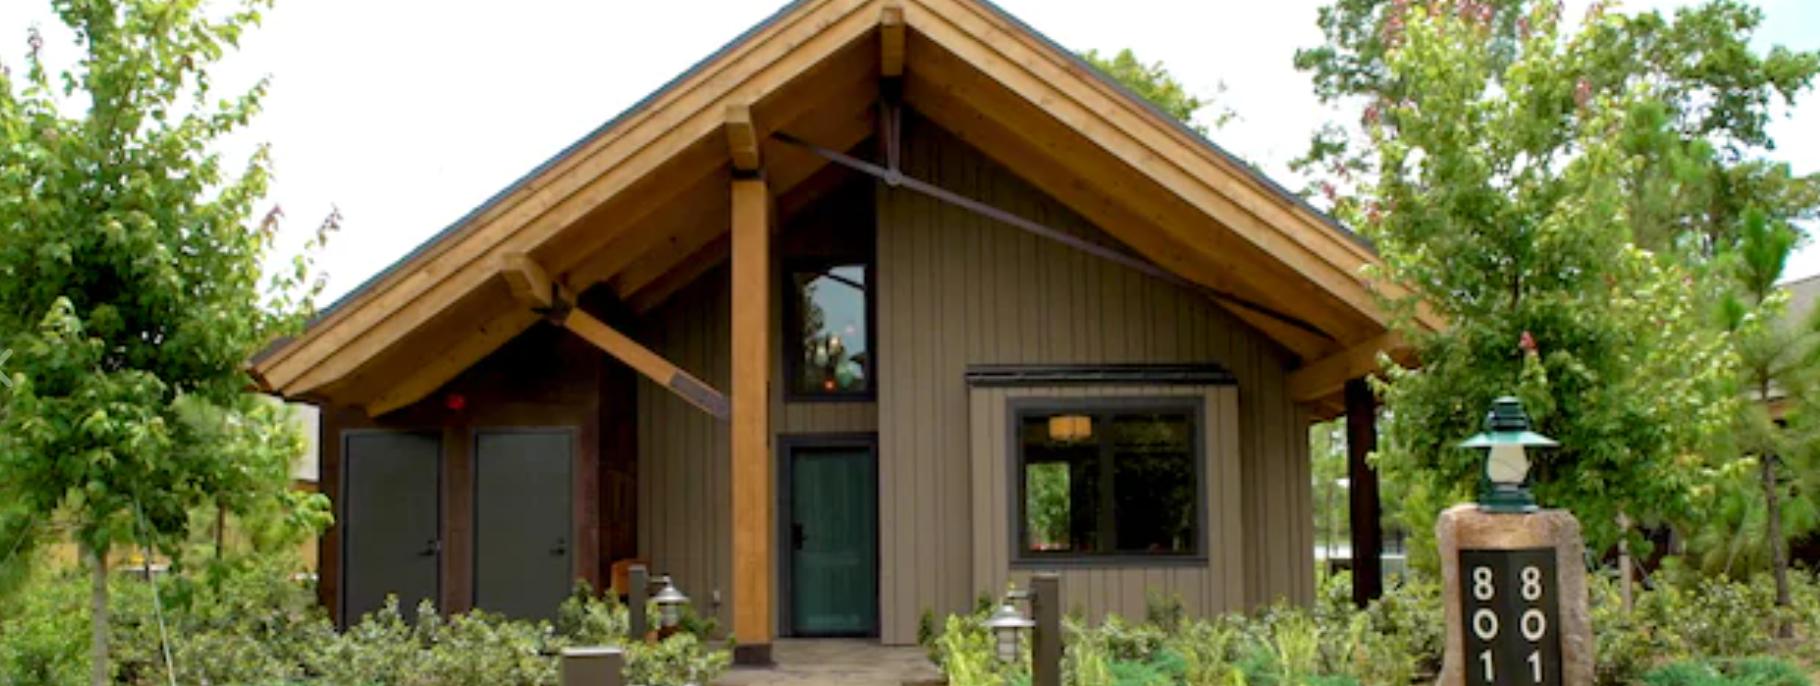 disney wilderness lodge cabin